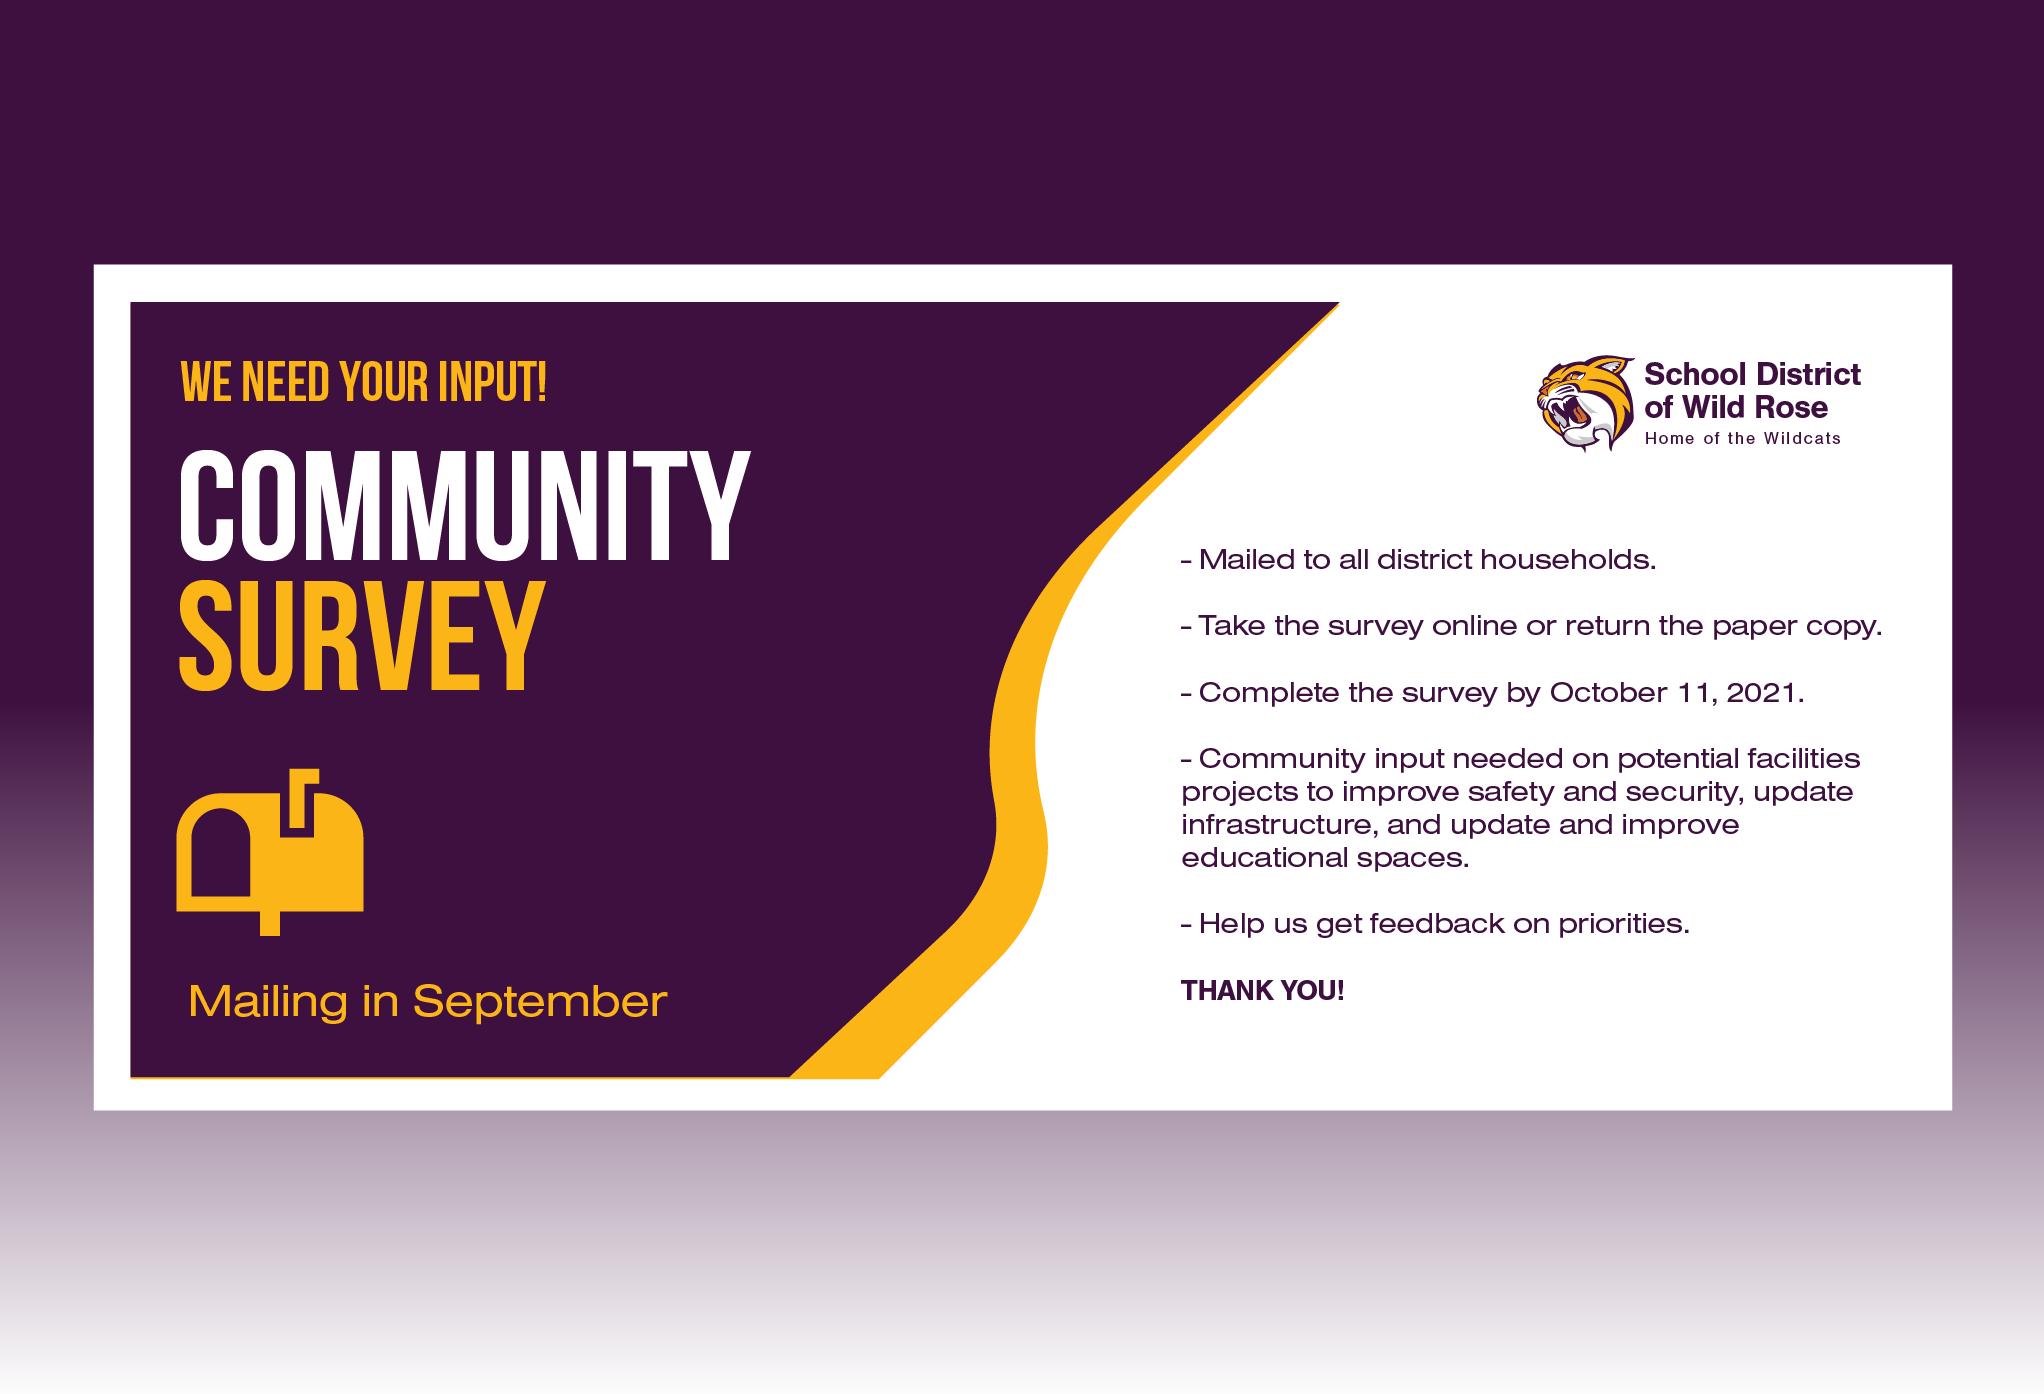 Community Survey Reminder